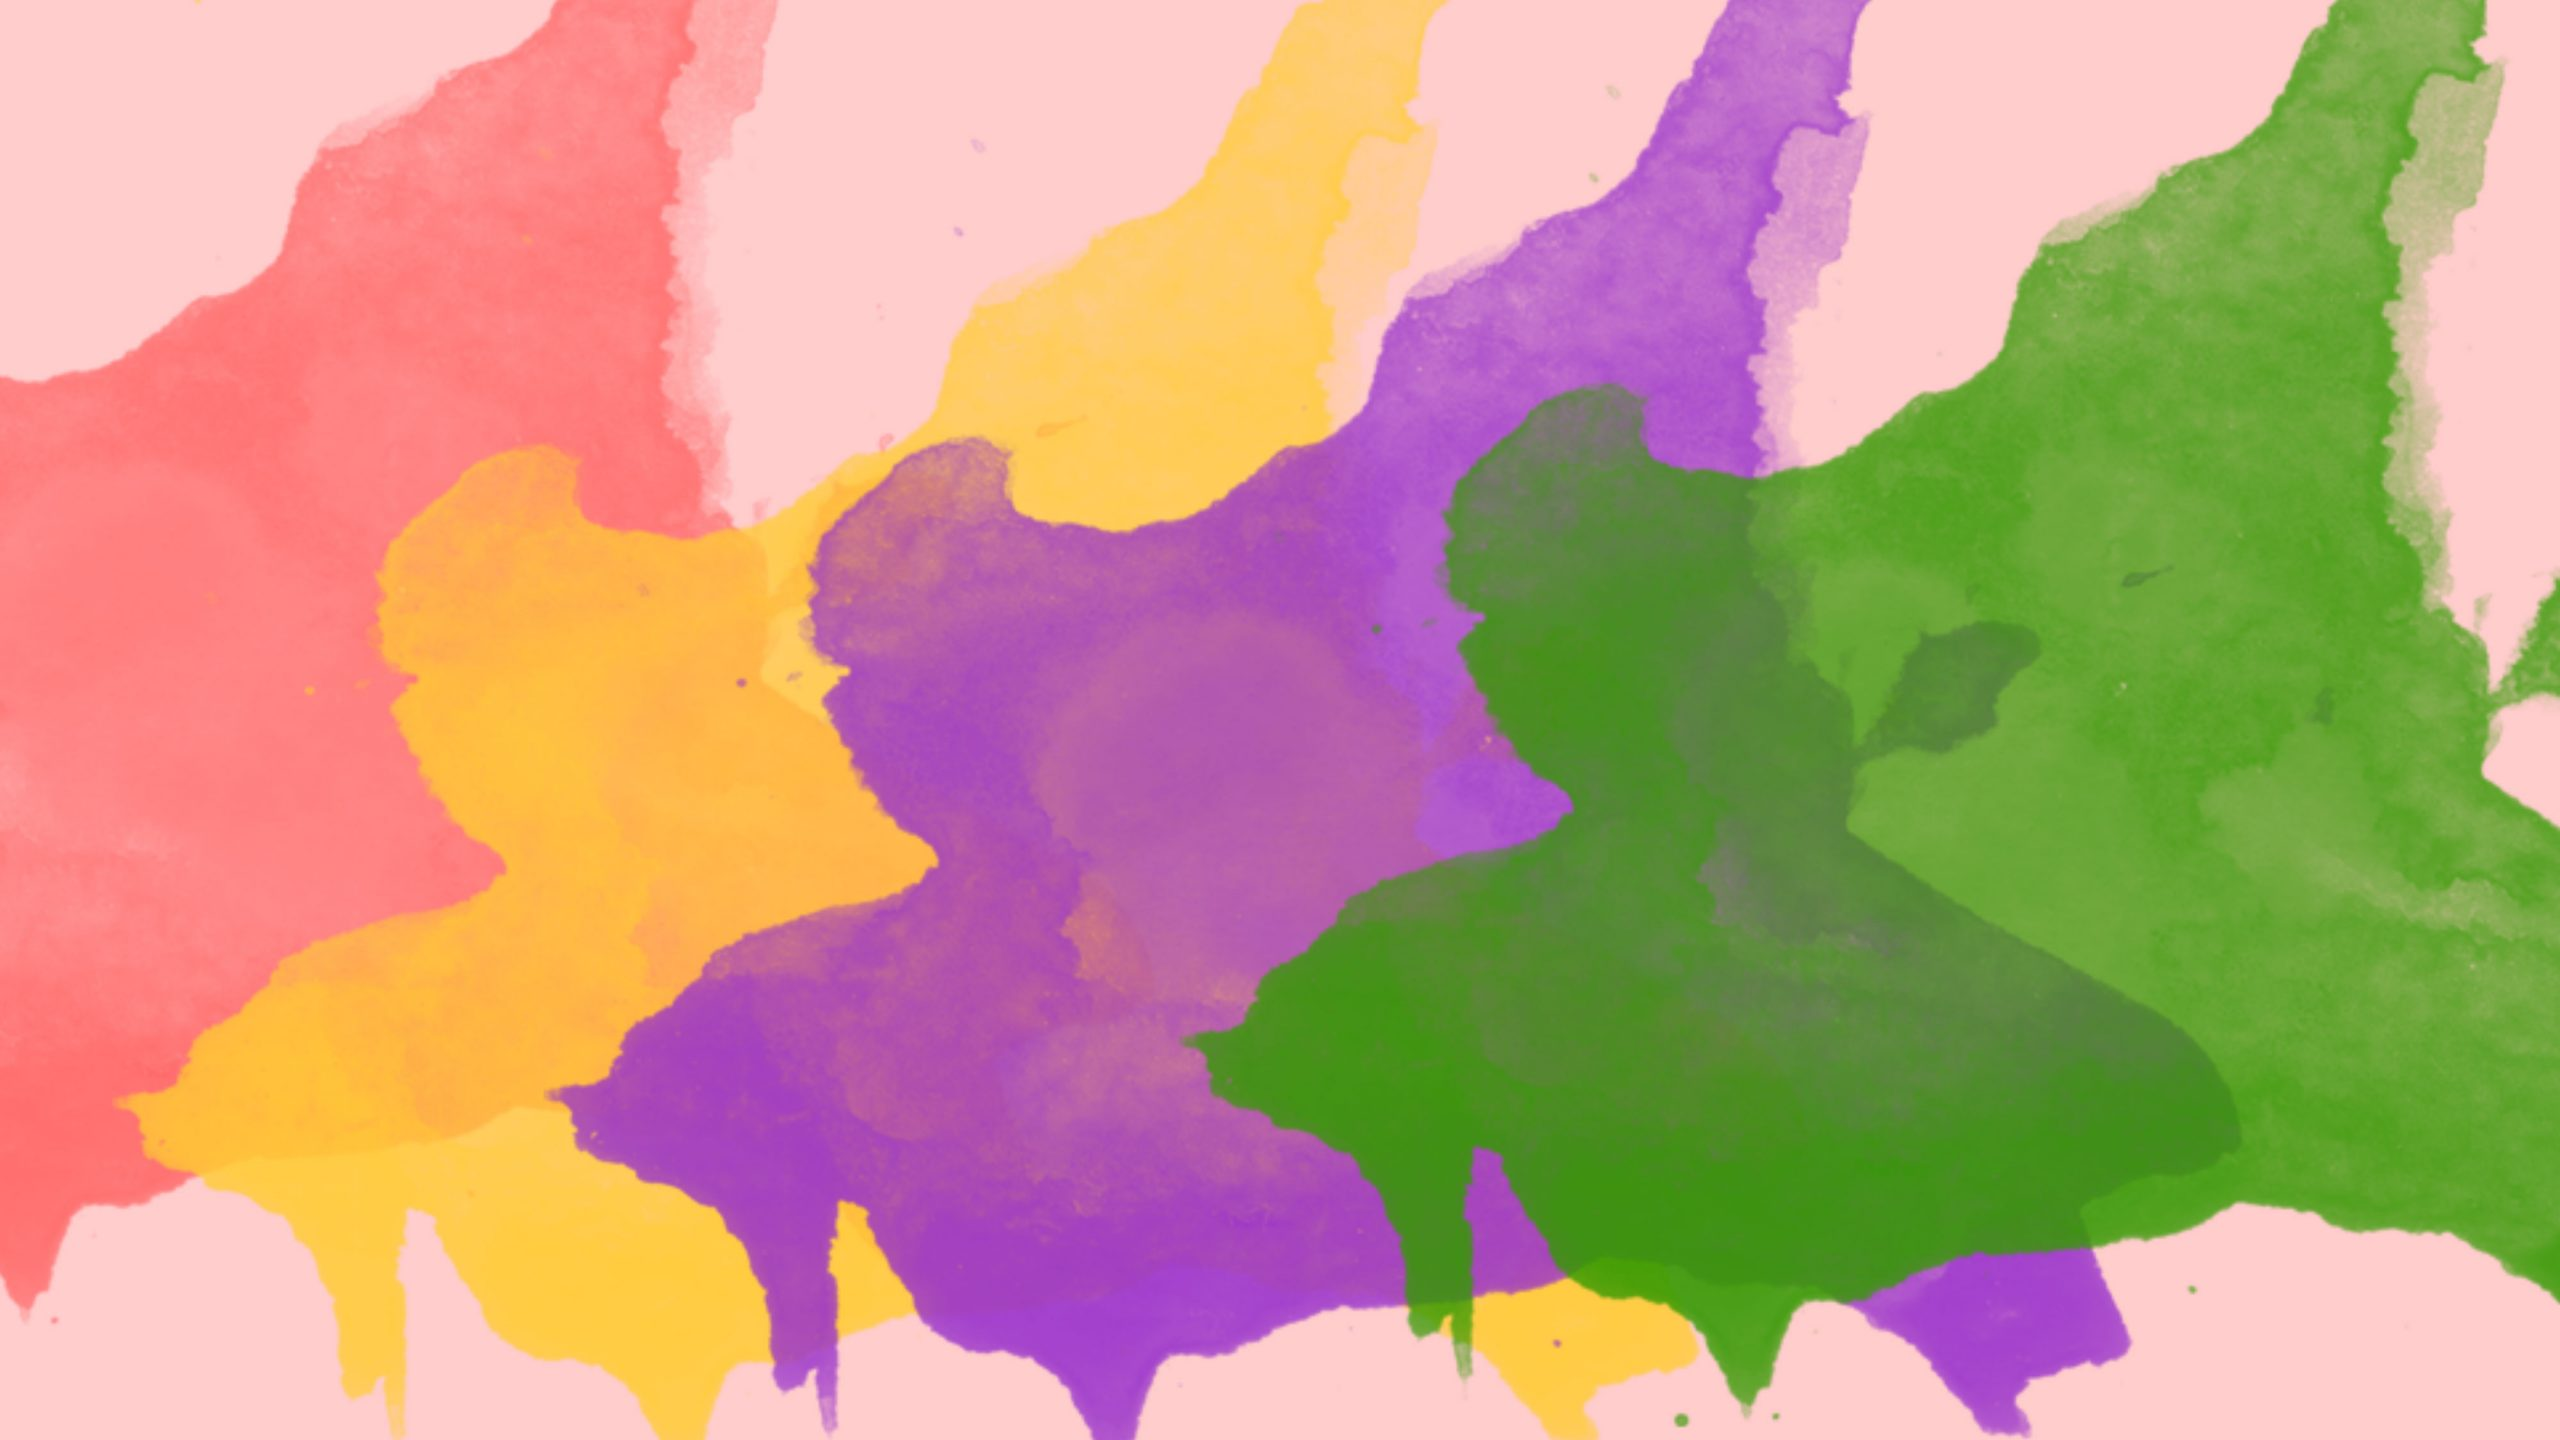 water-color-illustration-background